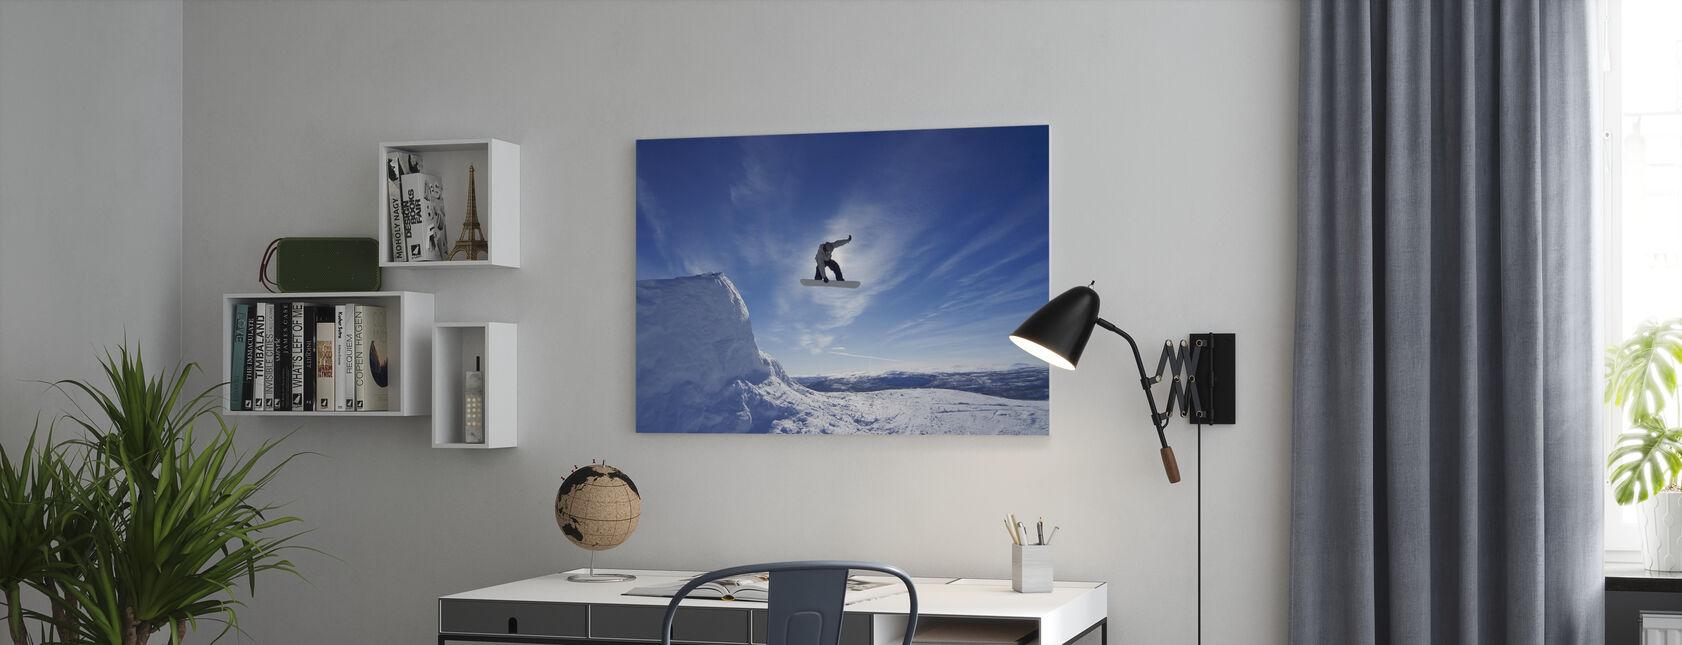 Snowboard Big Air Jump - Canvas print - Kantoor